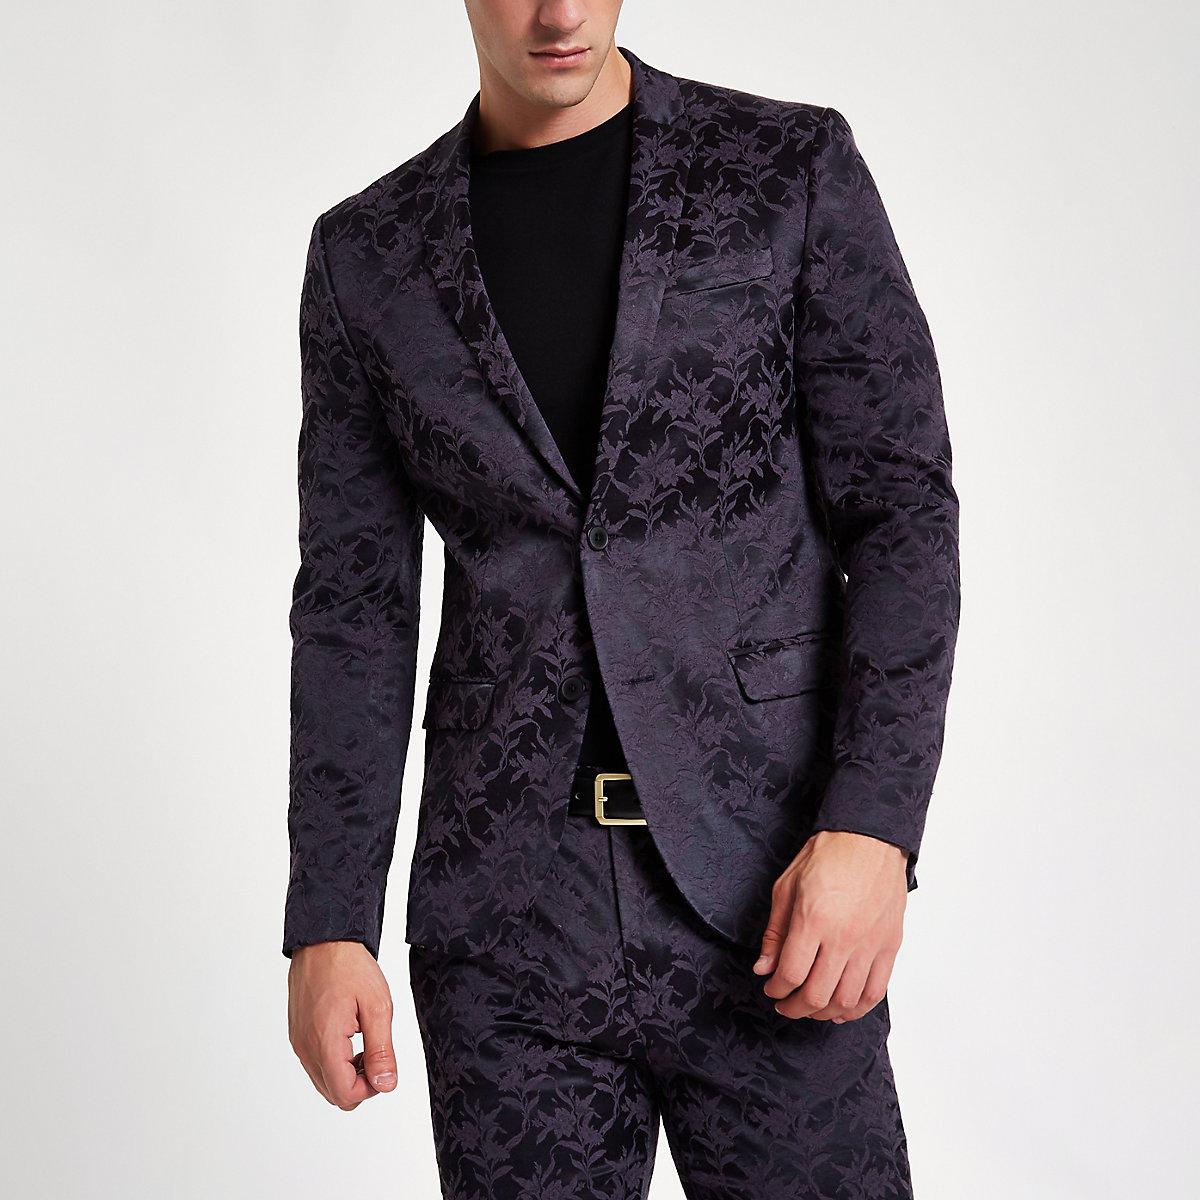 Purple floral skinny fit suit jacket